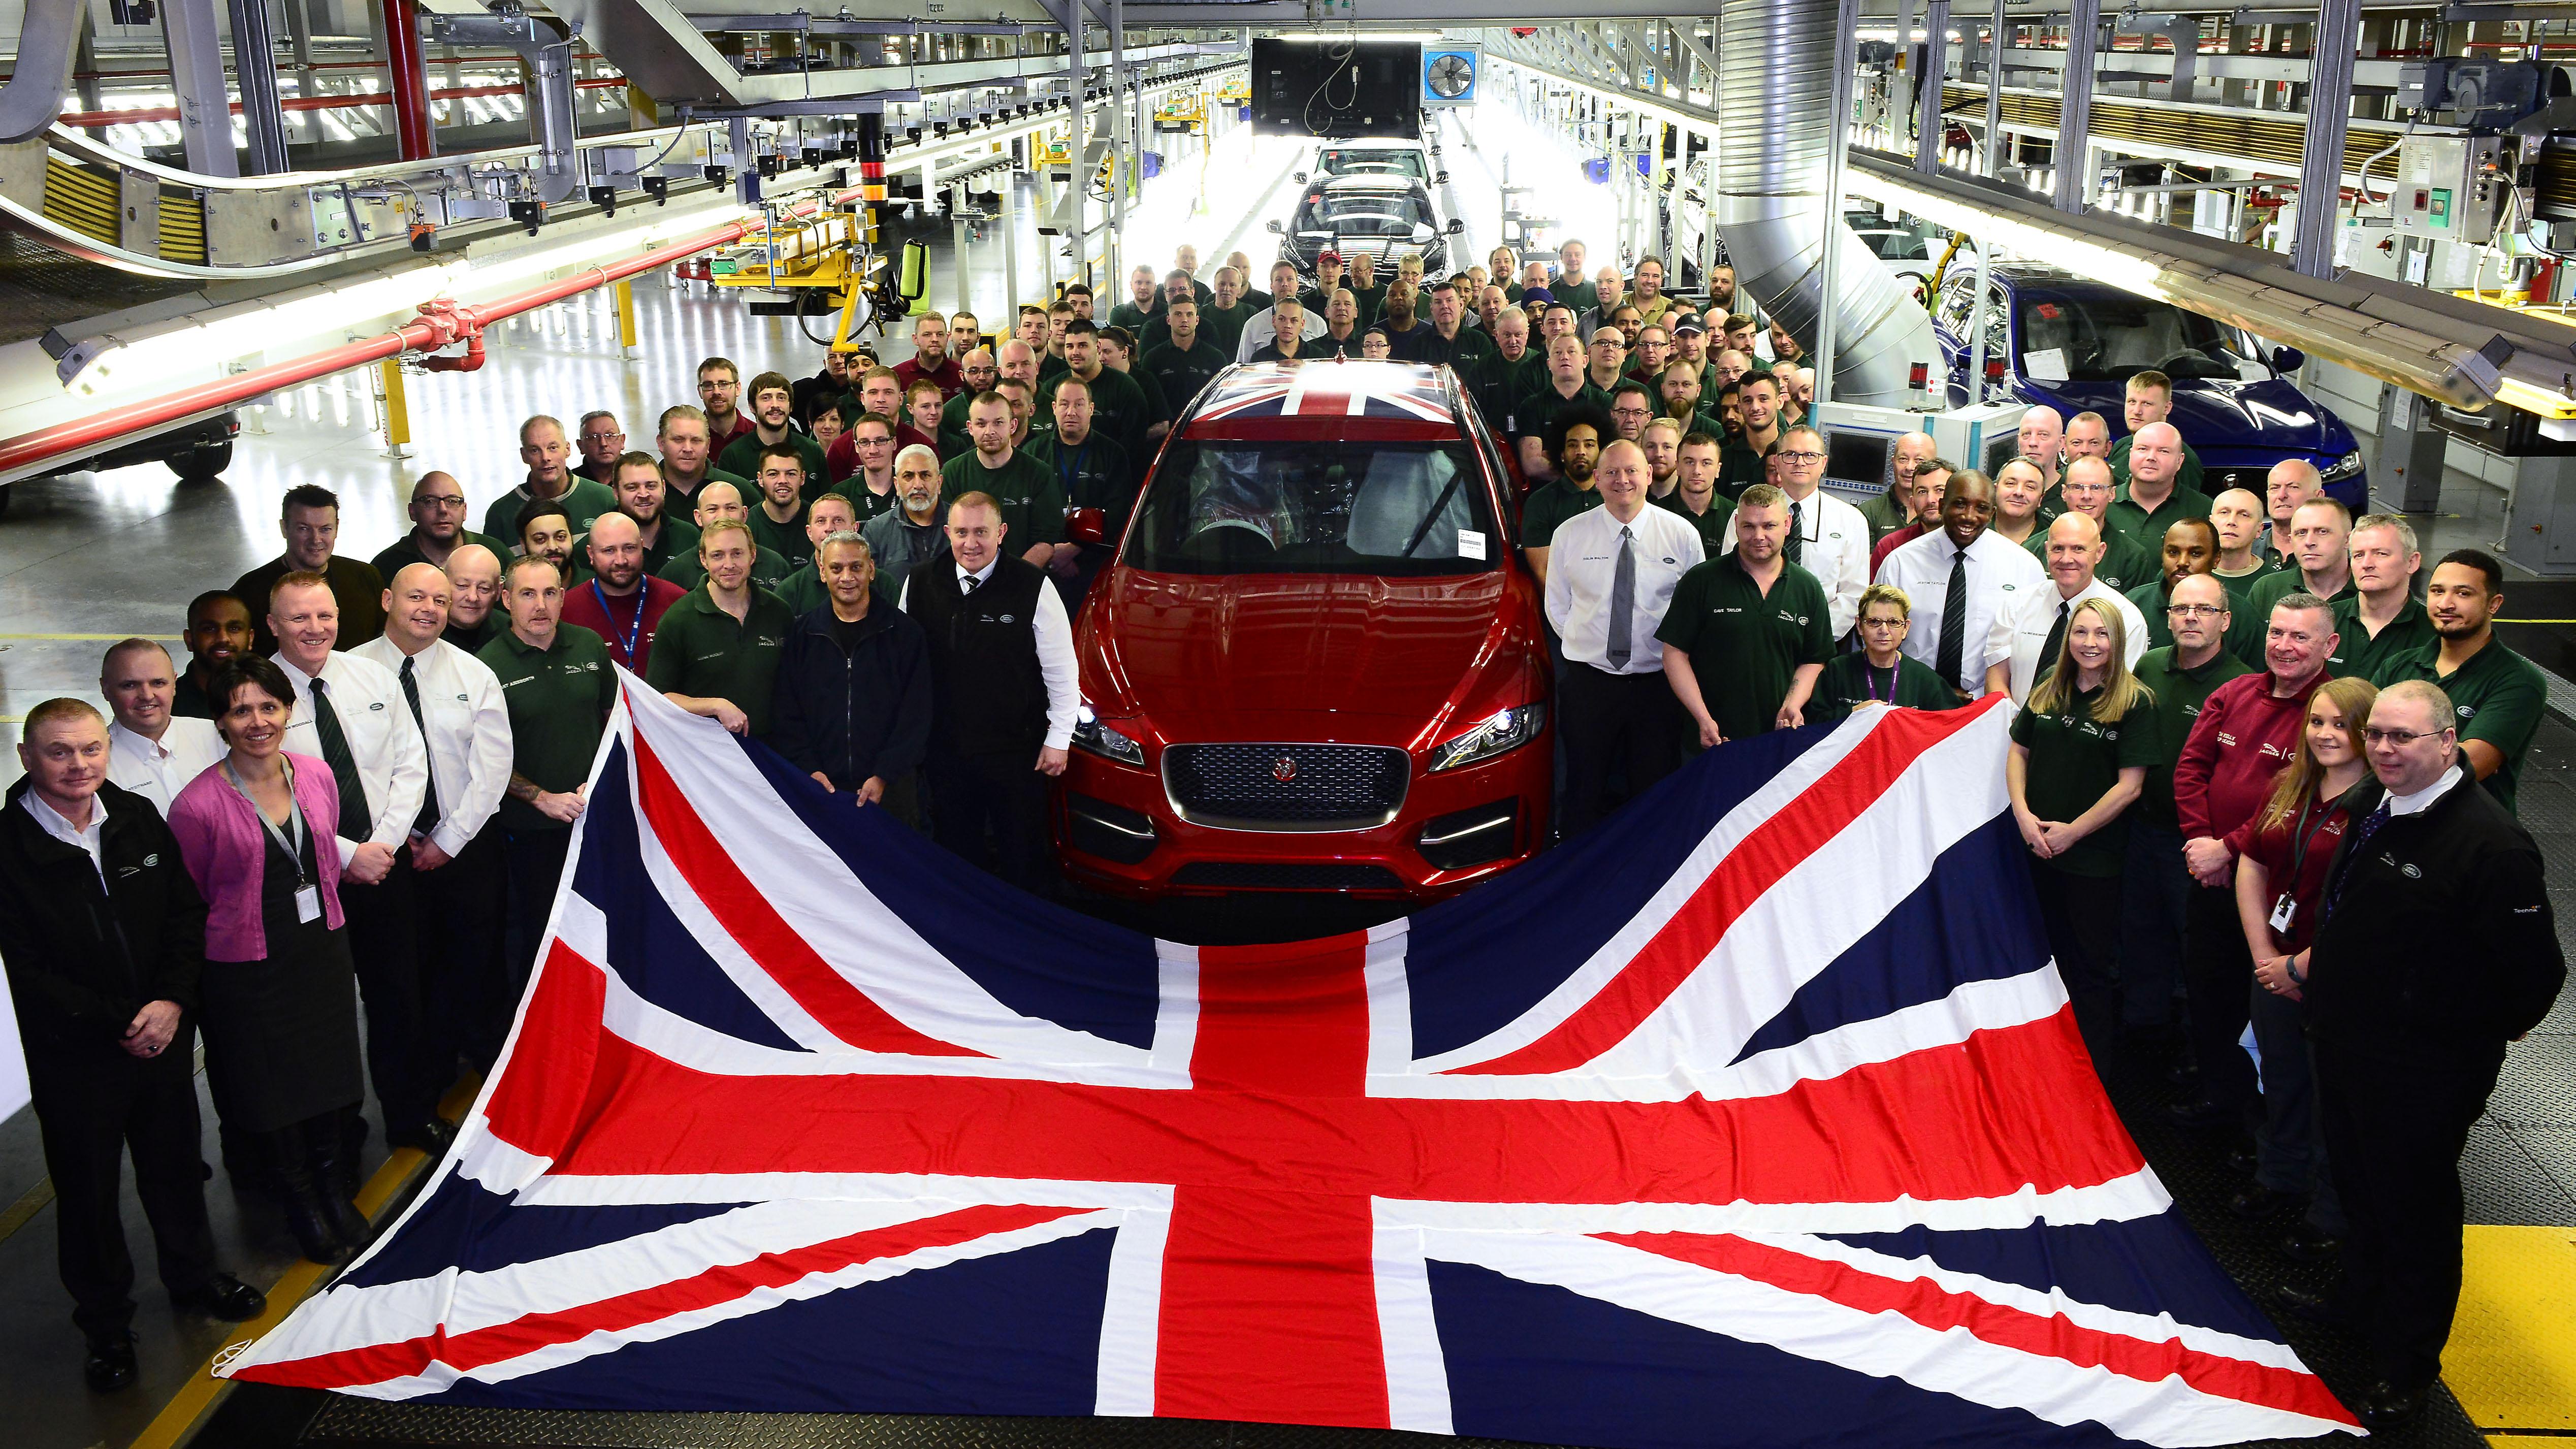 britain's biggest companies - HD1920×1003